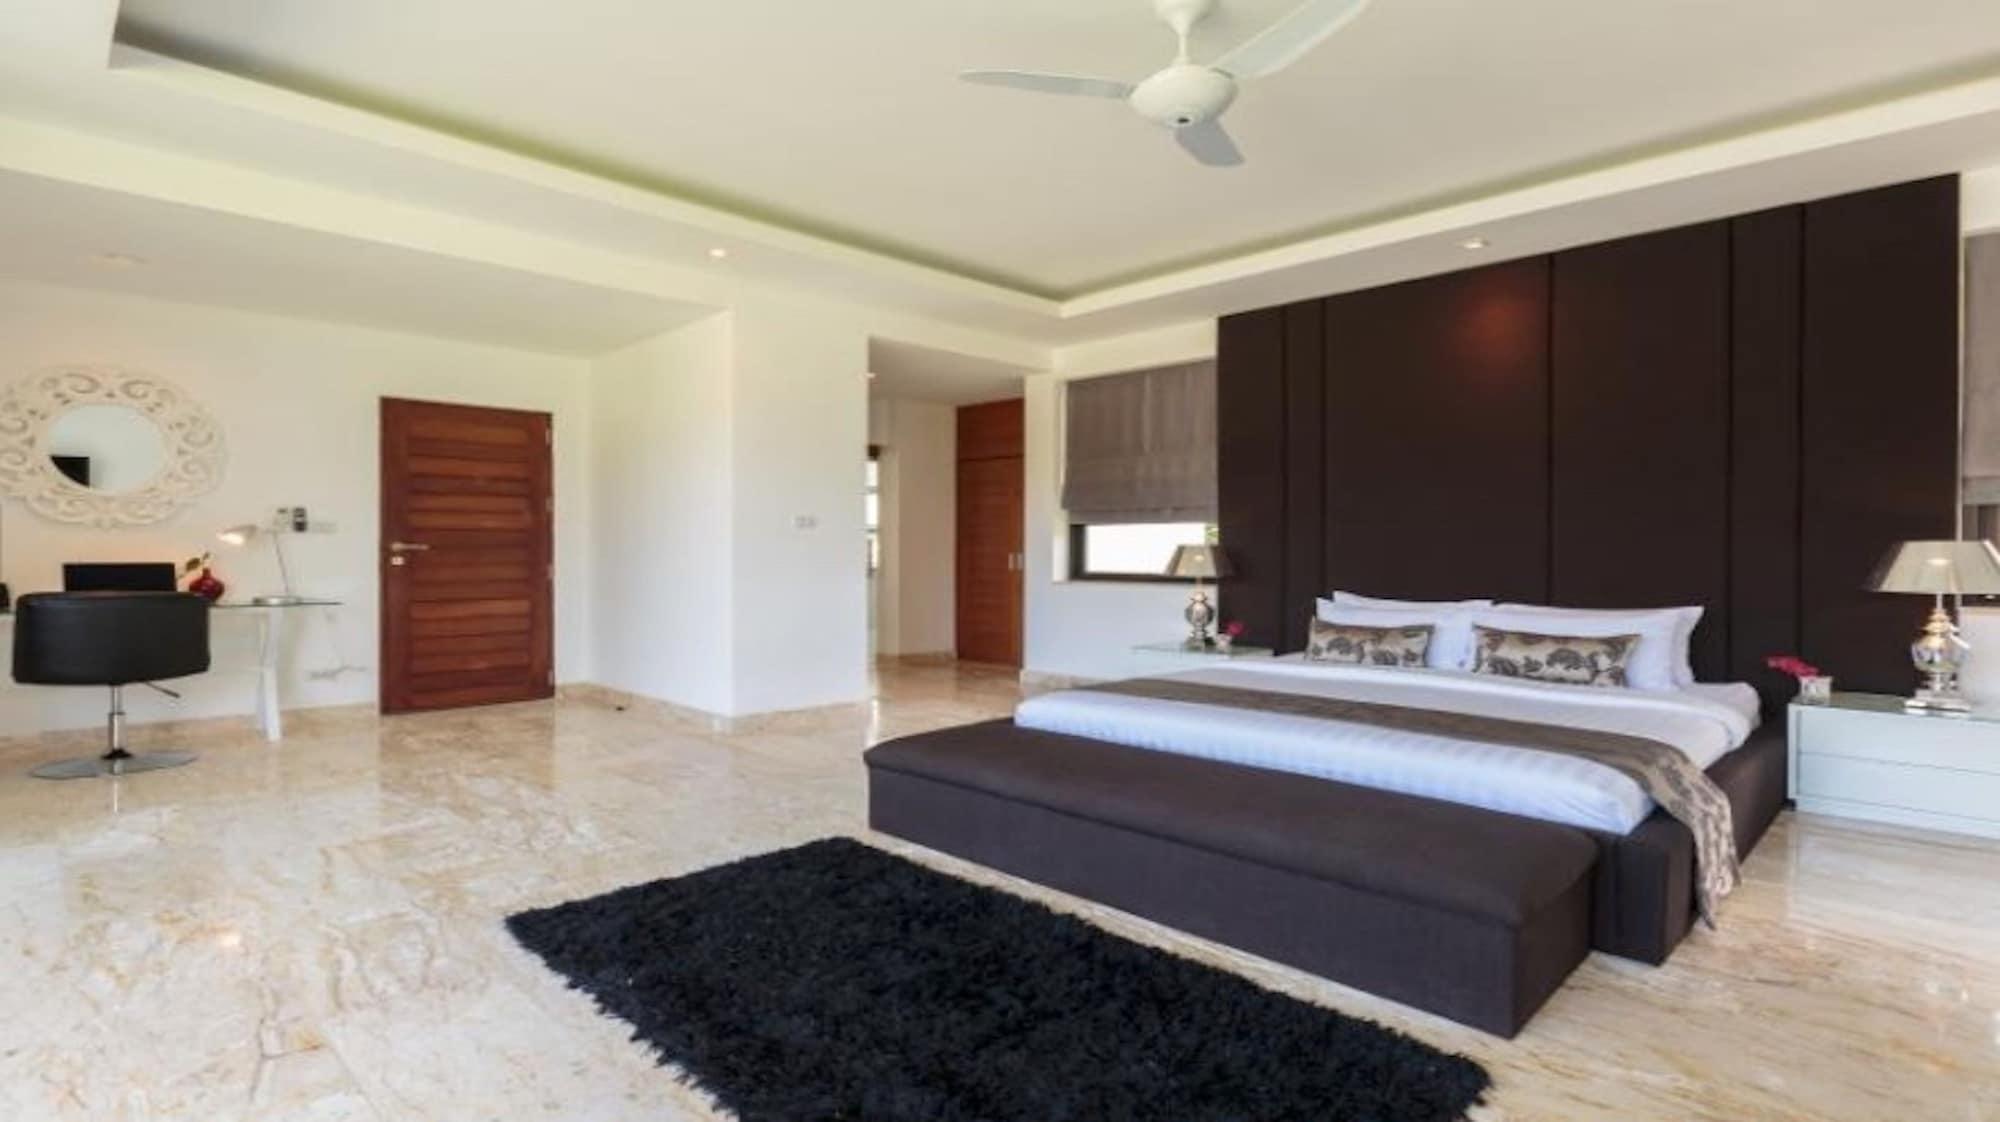 3 Bedroomed Luxury Ban Tai, Ko Samui